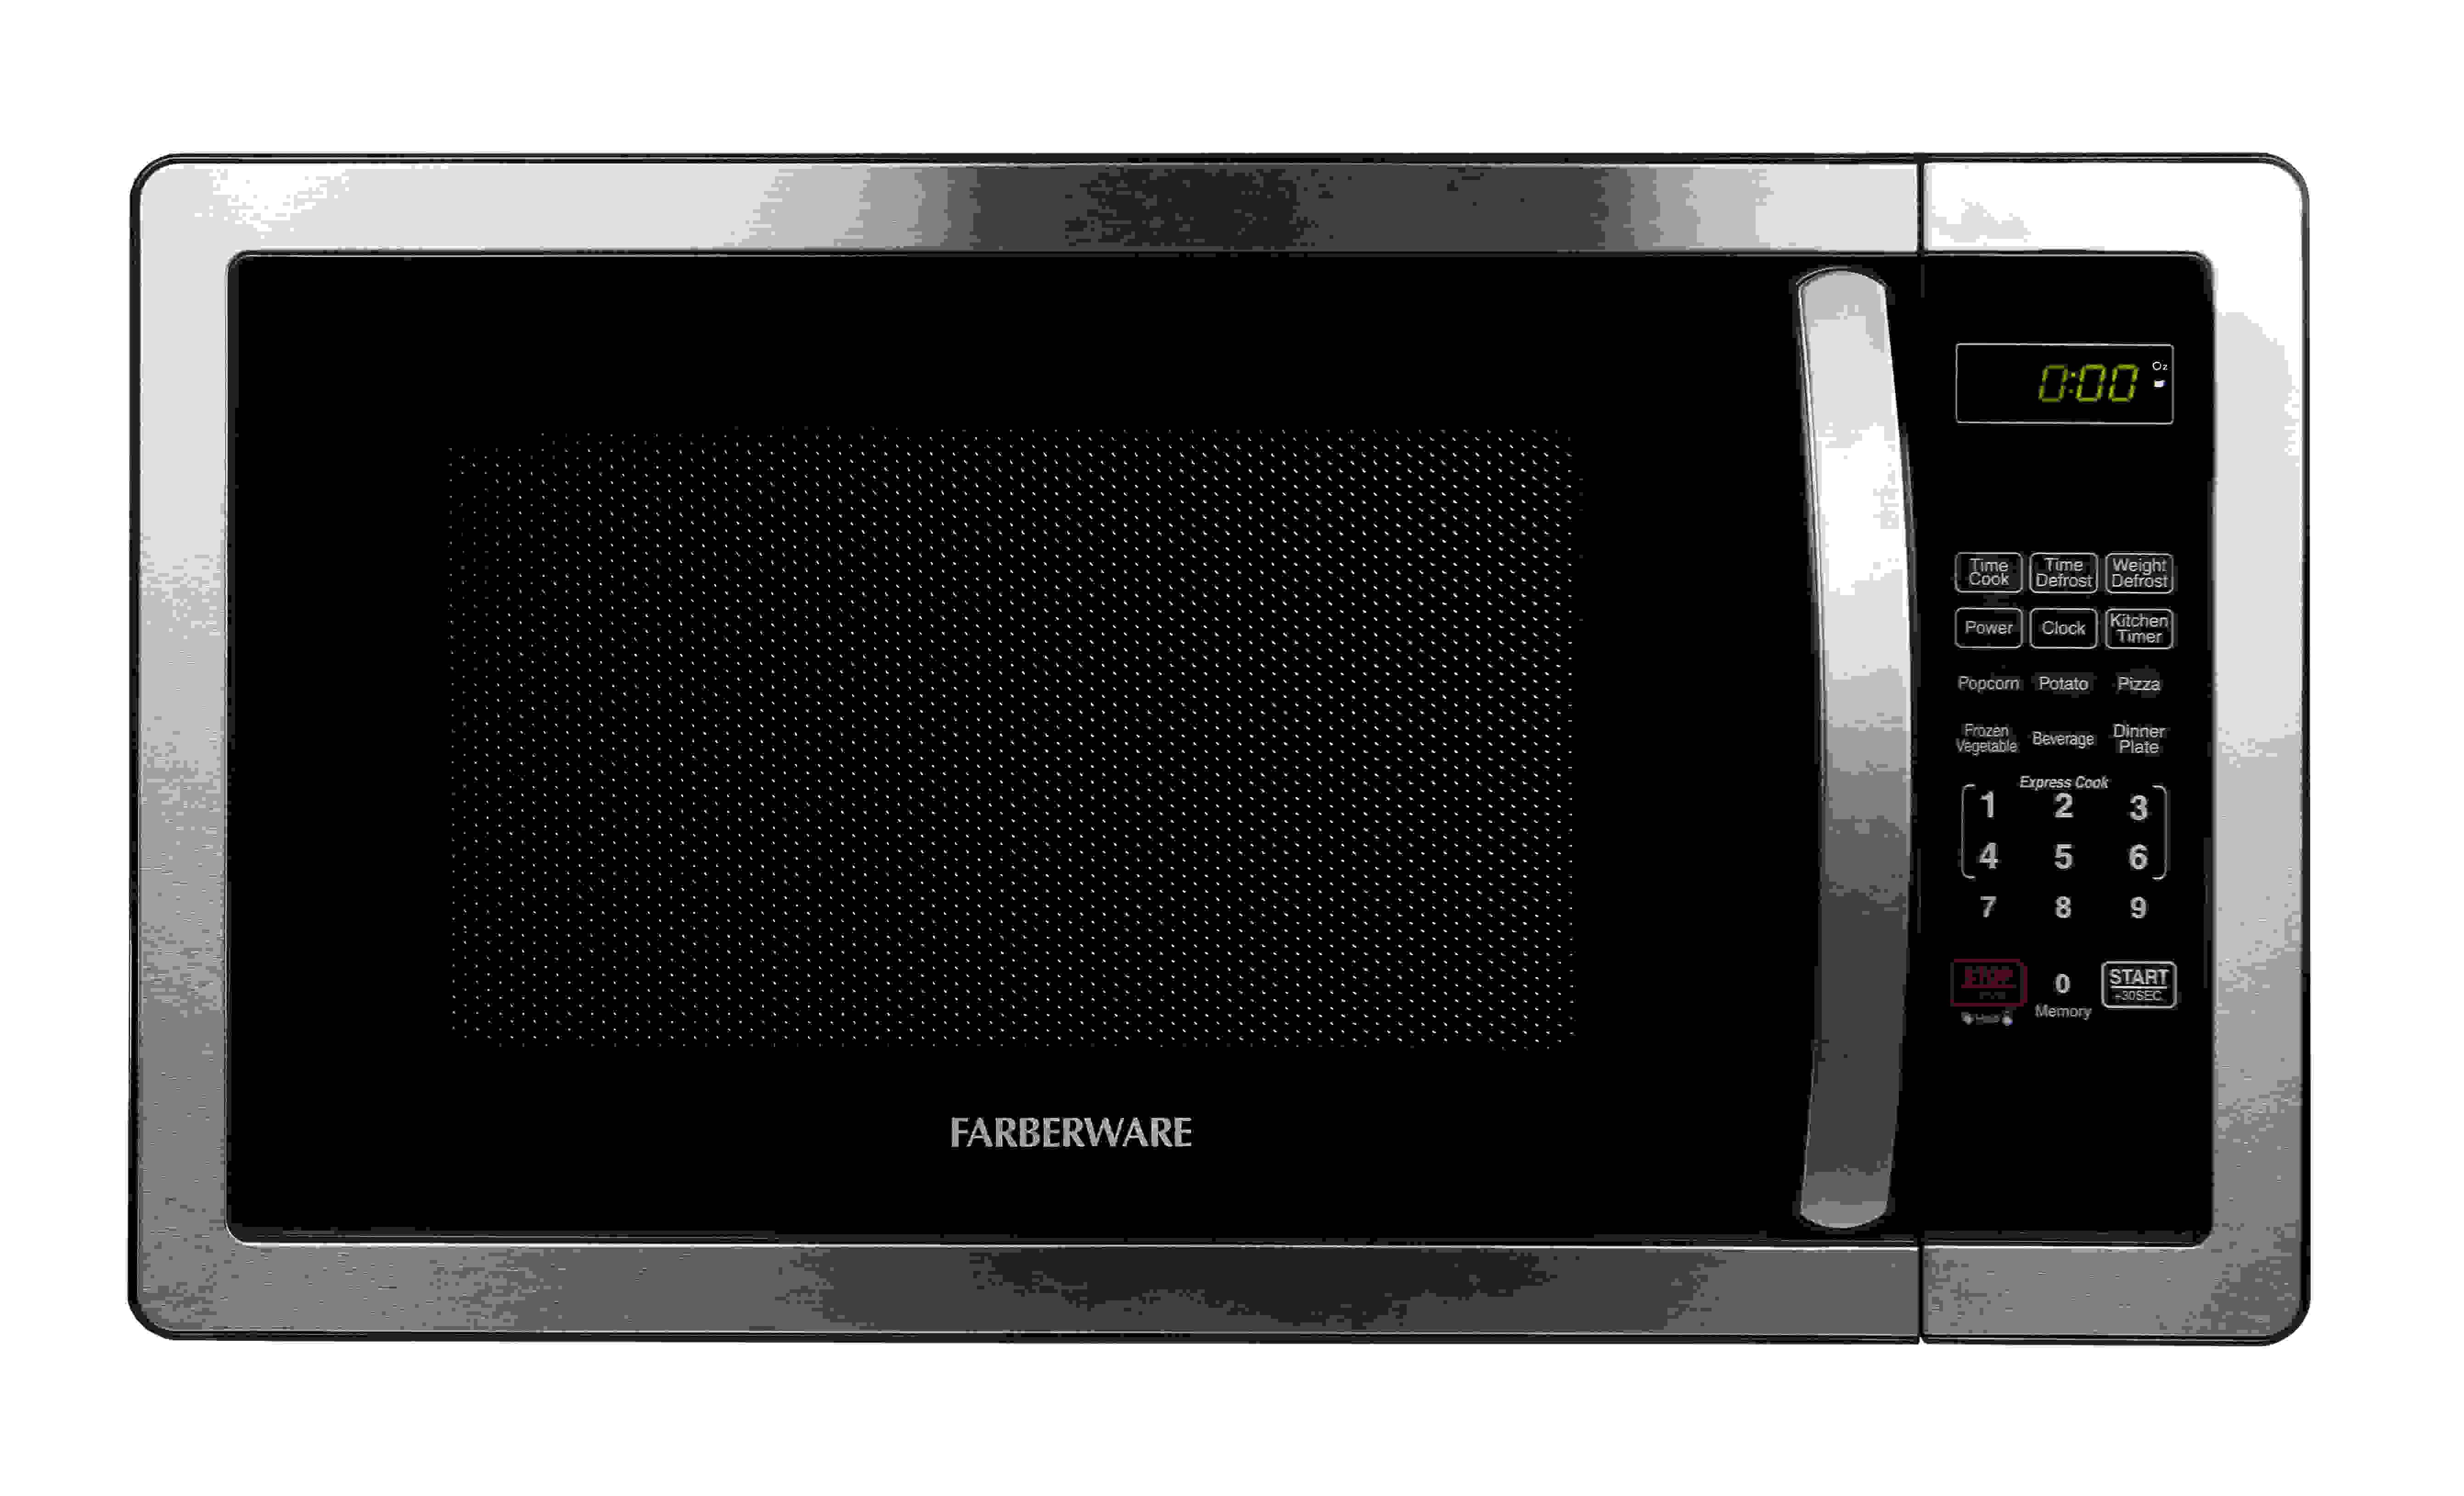 Farberware Classic FMO11AHTBKB 1.1 Cu. Ft 1000-Watt Microwave Oven, Stainless Steel